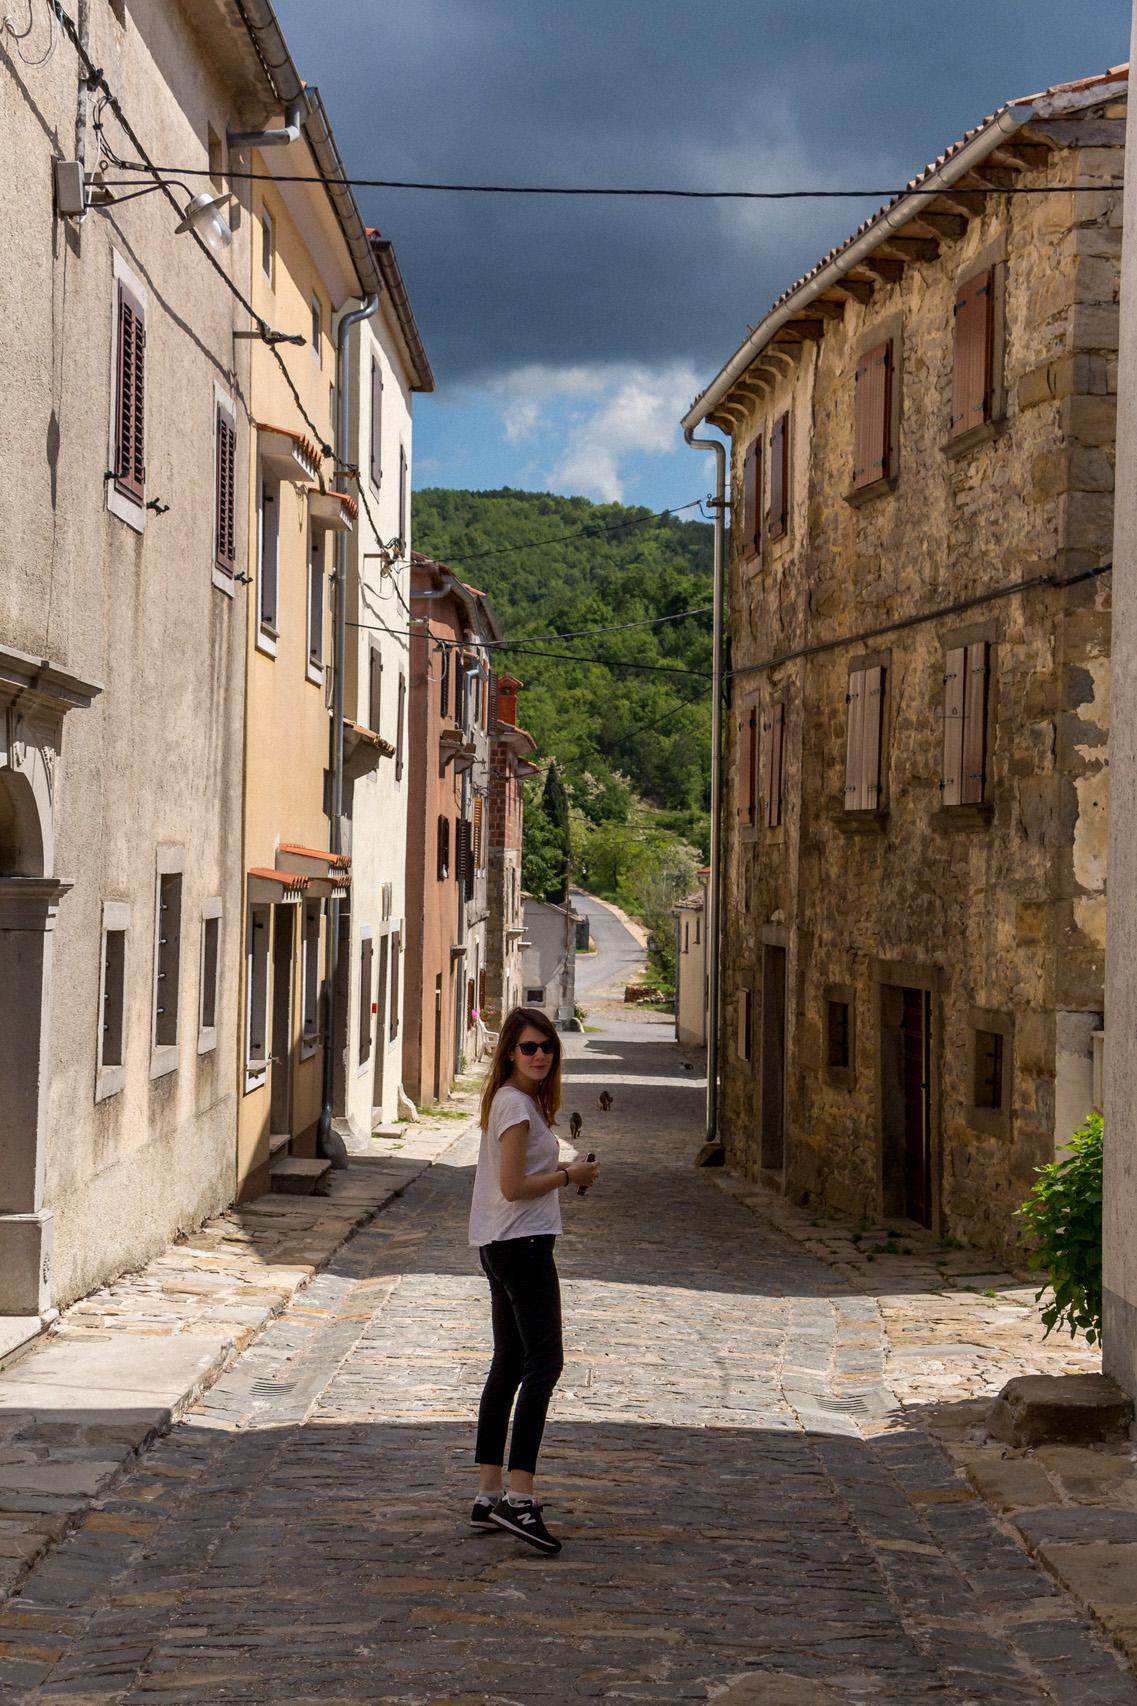 Draguc-Istra